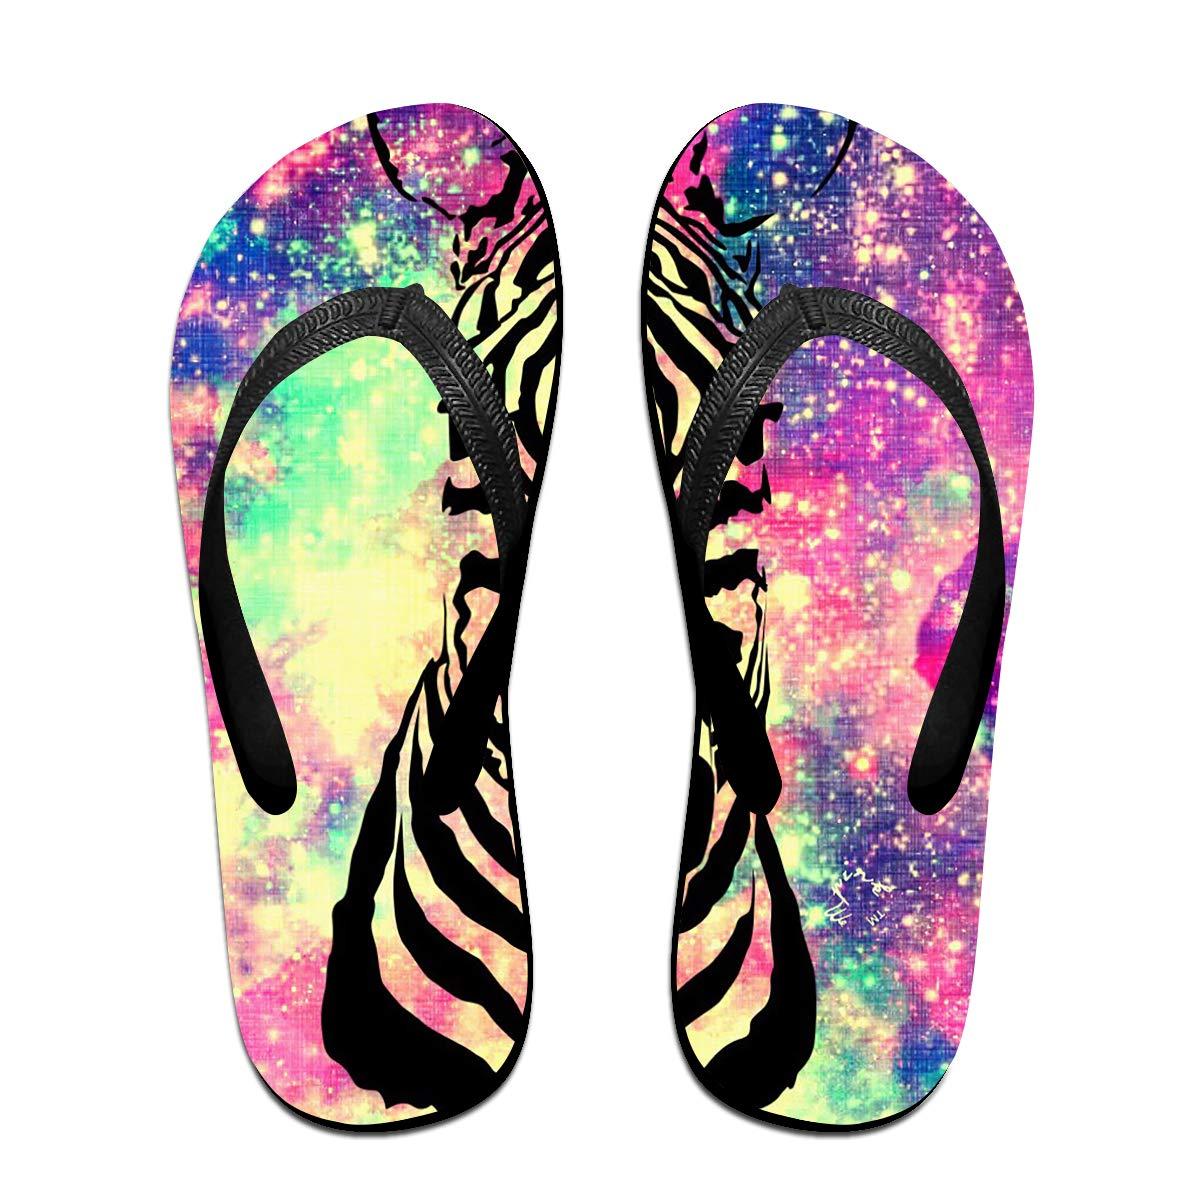 3961c6bbdf32a Amazon.com  Couple Slipper Zebra Universe Print Flip Flops Unisex Chic  Sandals Rubber Non-Slip Spa Thong Slippers  Clothing